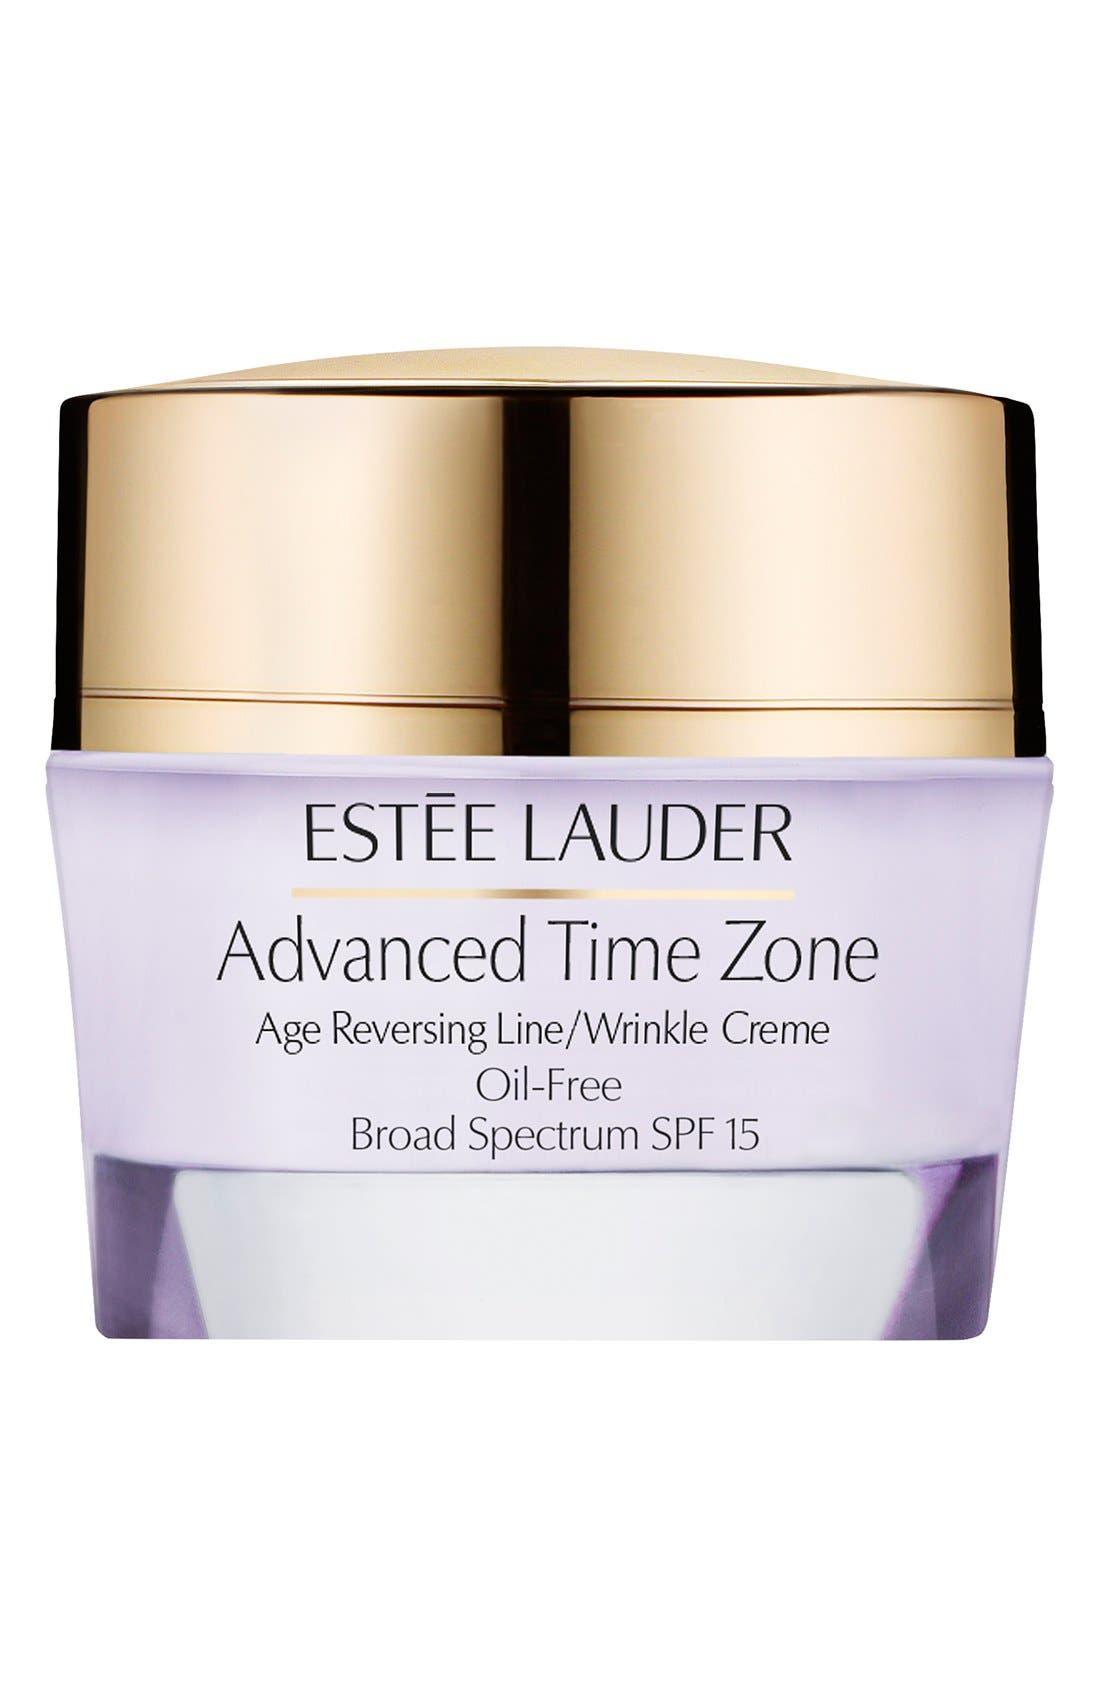 Estée Lauder Advanced Time Zone Age Reversing Line/Wrinkle Creme Oil-Free Broad Spectrum SPF 15